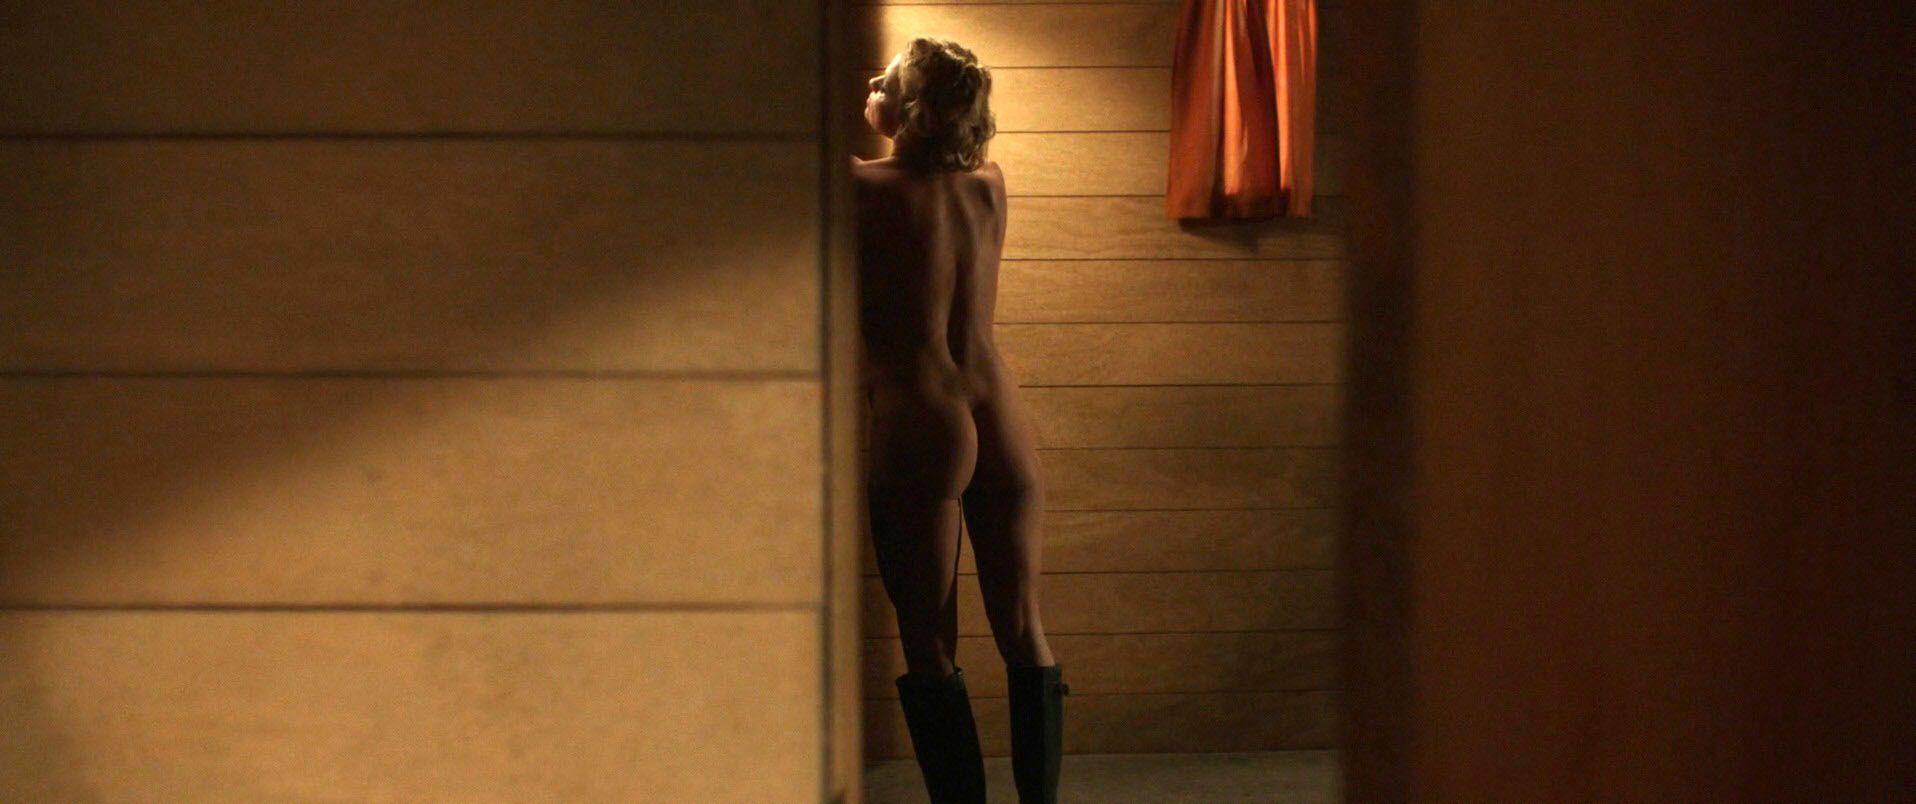 Pamela Anderson Nude 6 Sn1952